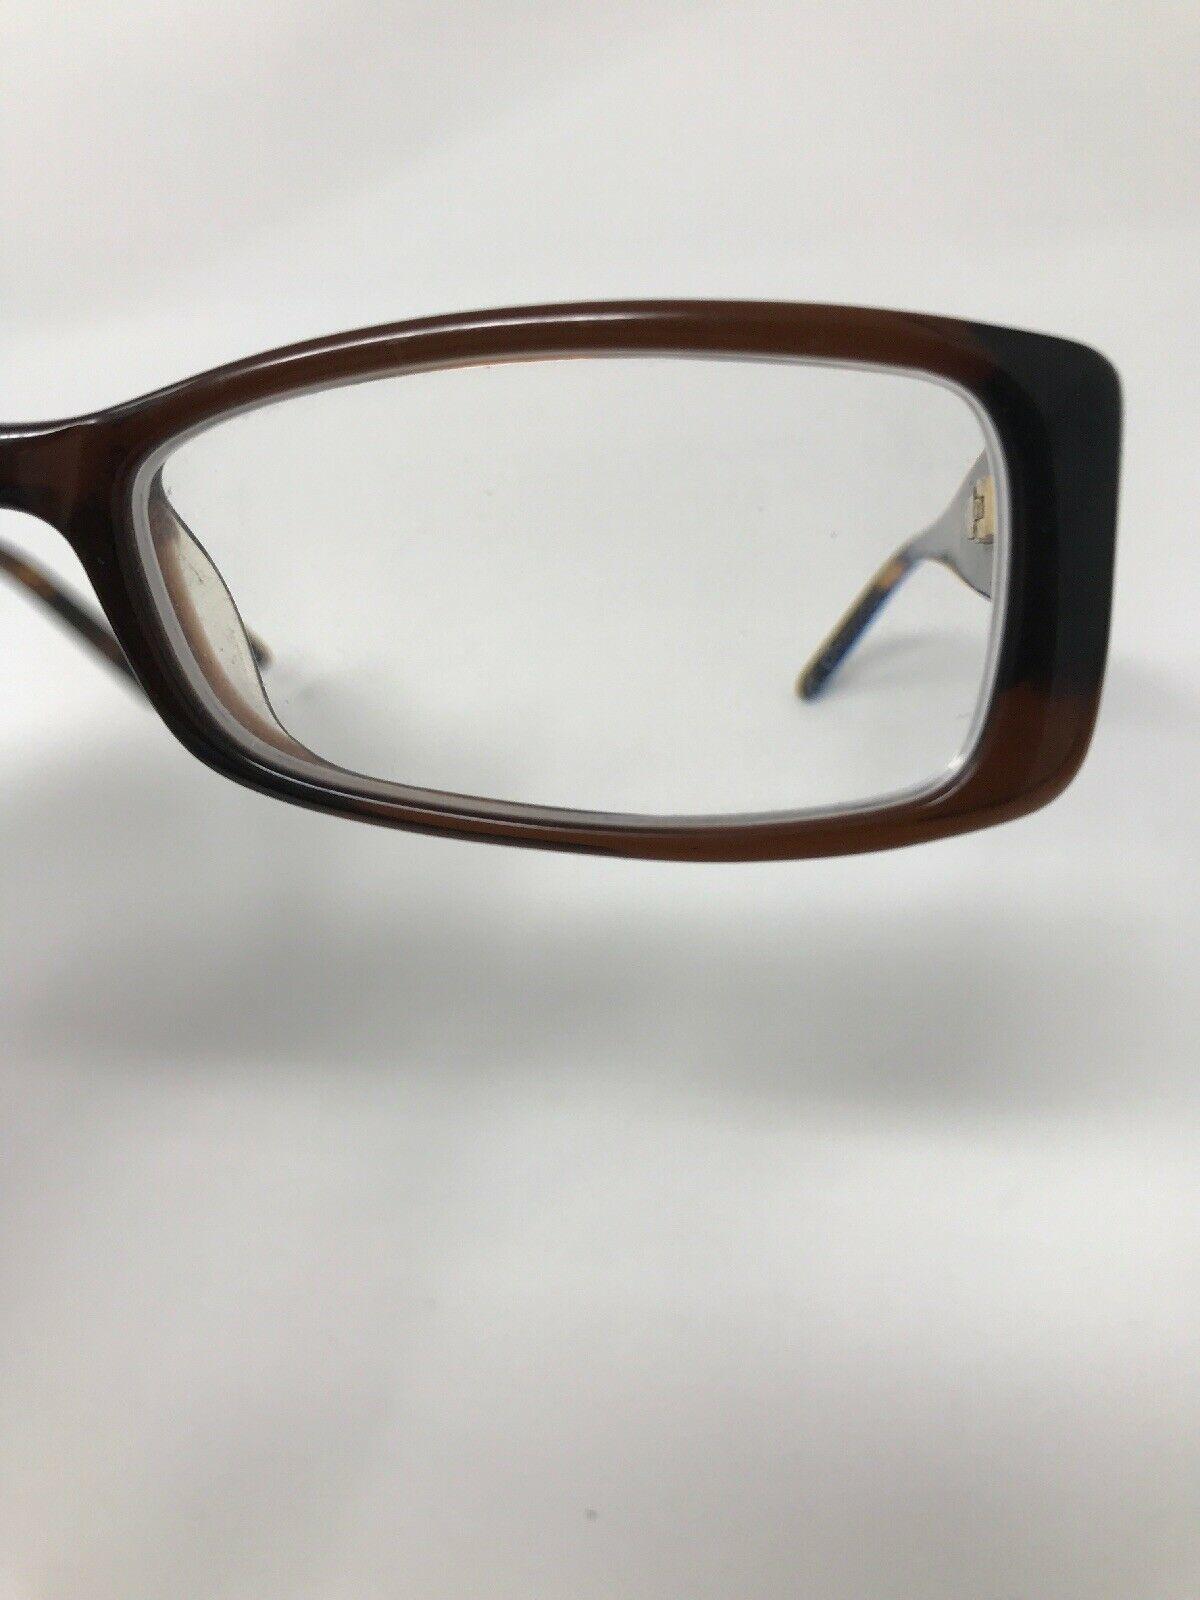 CALVIN KLEIN Eyeglasses Frame CK5744 210 49-15-135 Clear Brown/Monogram XE68